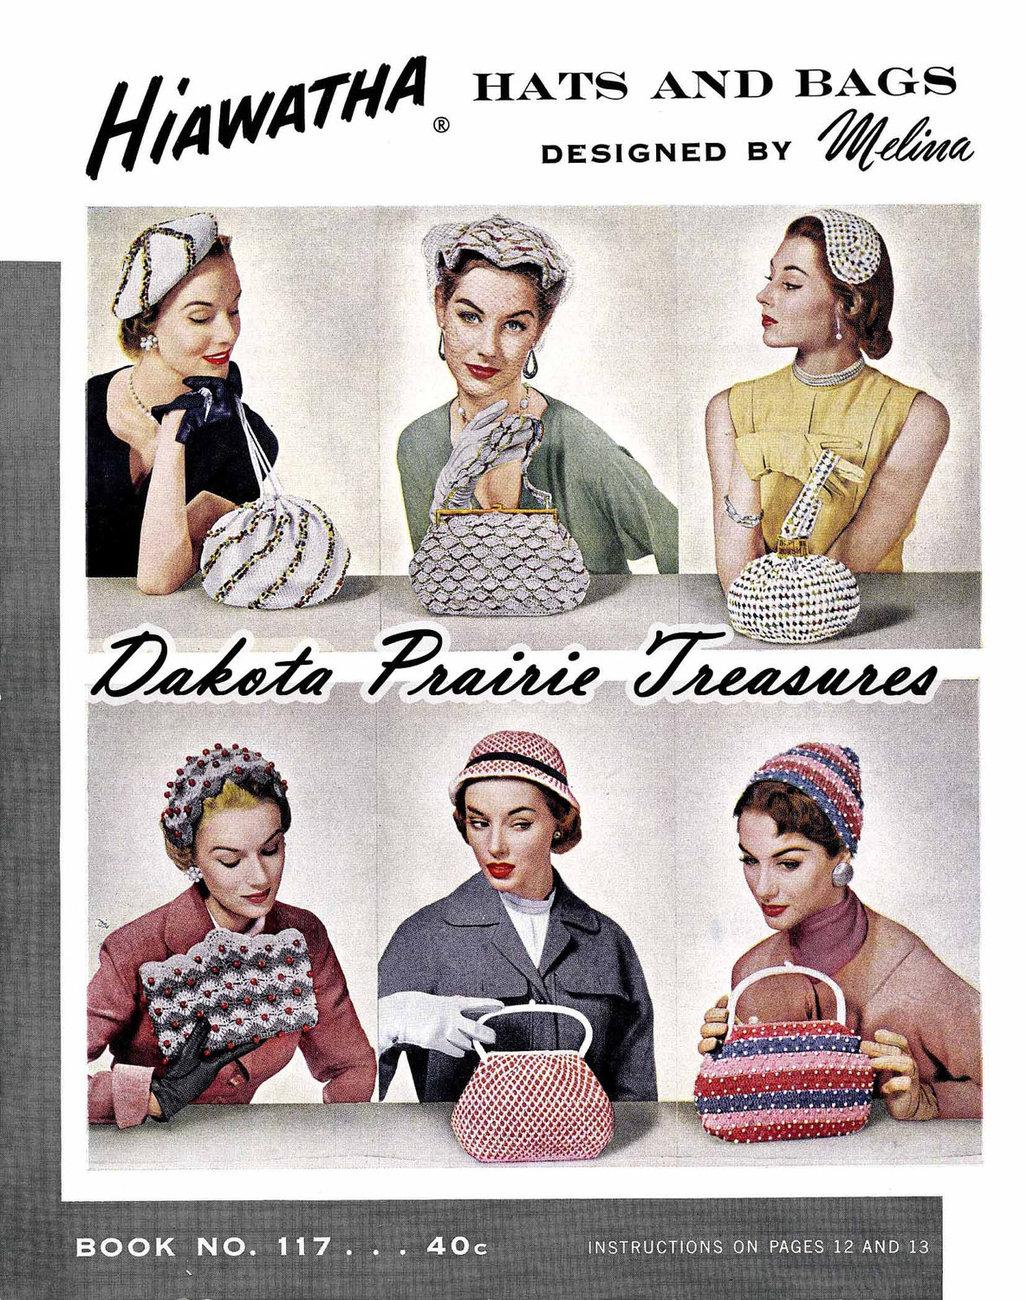 Post-WWII Swing Era Hiawatha Crochet Book Millinery Hats Bags Purse Patterns 195